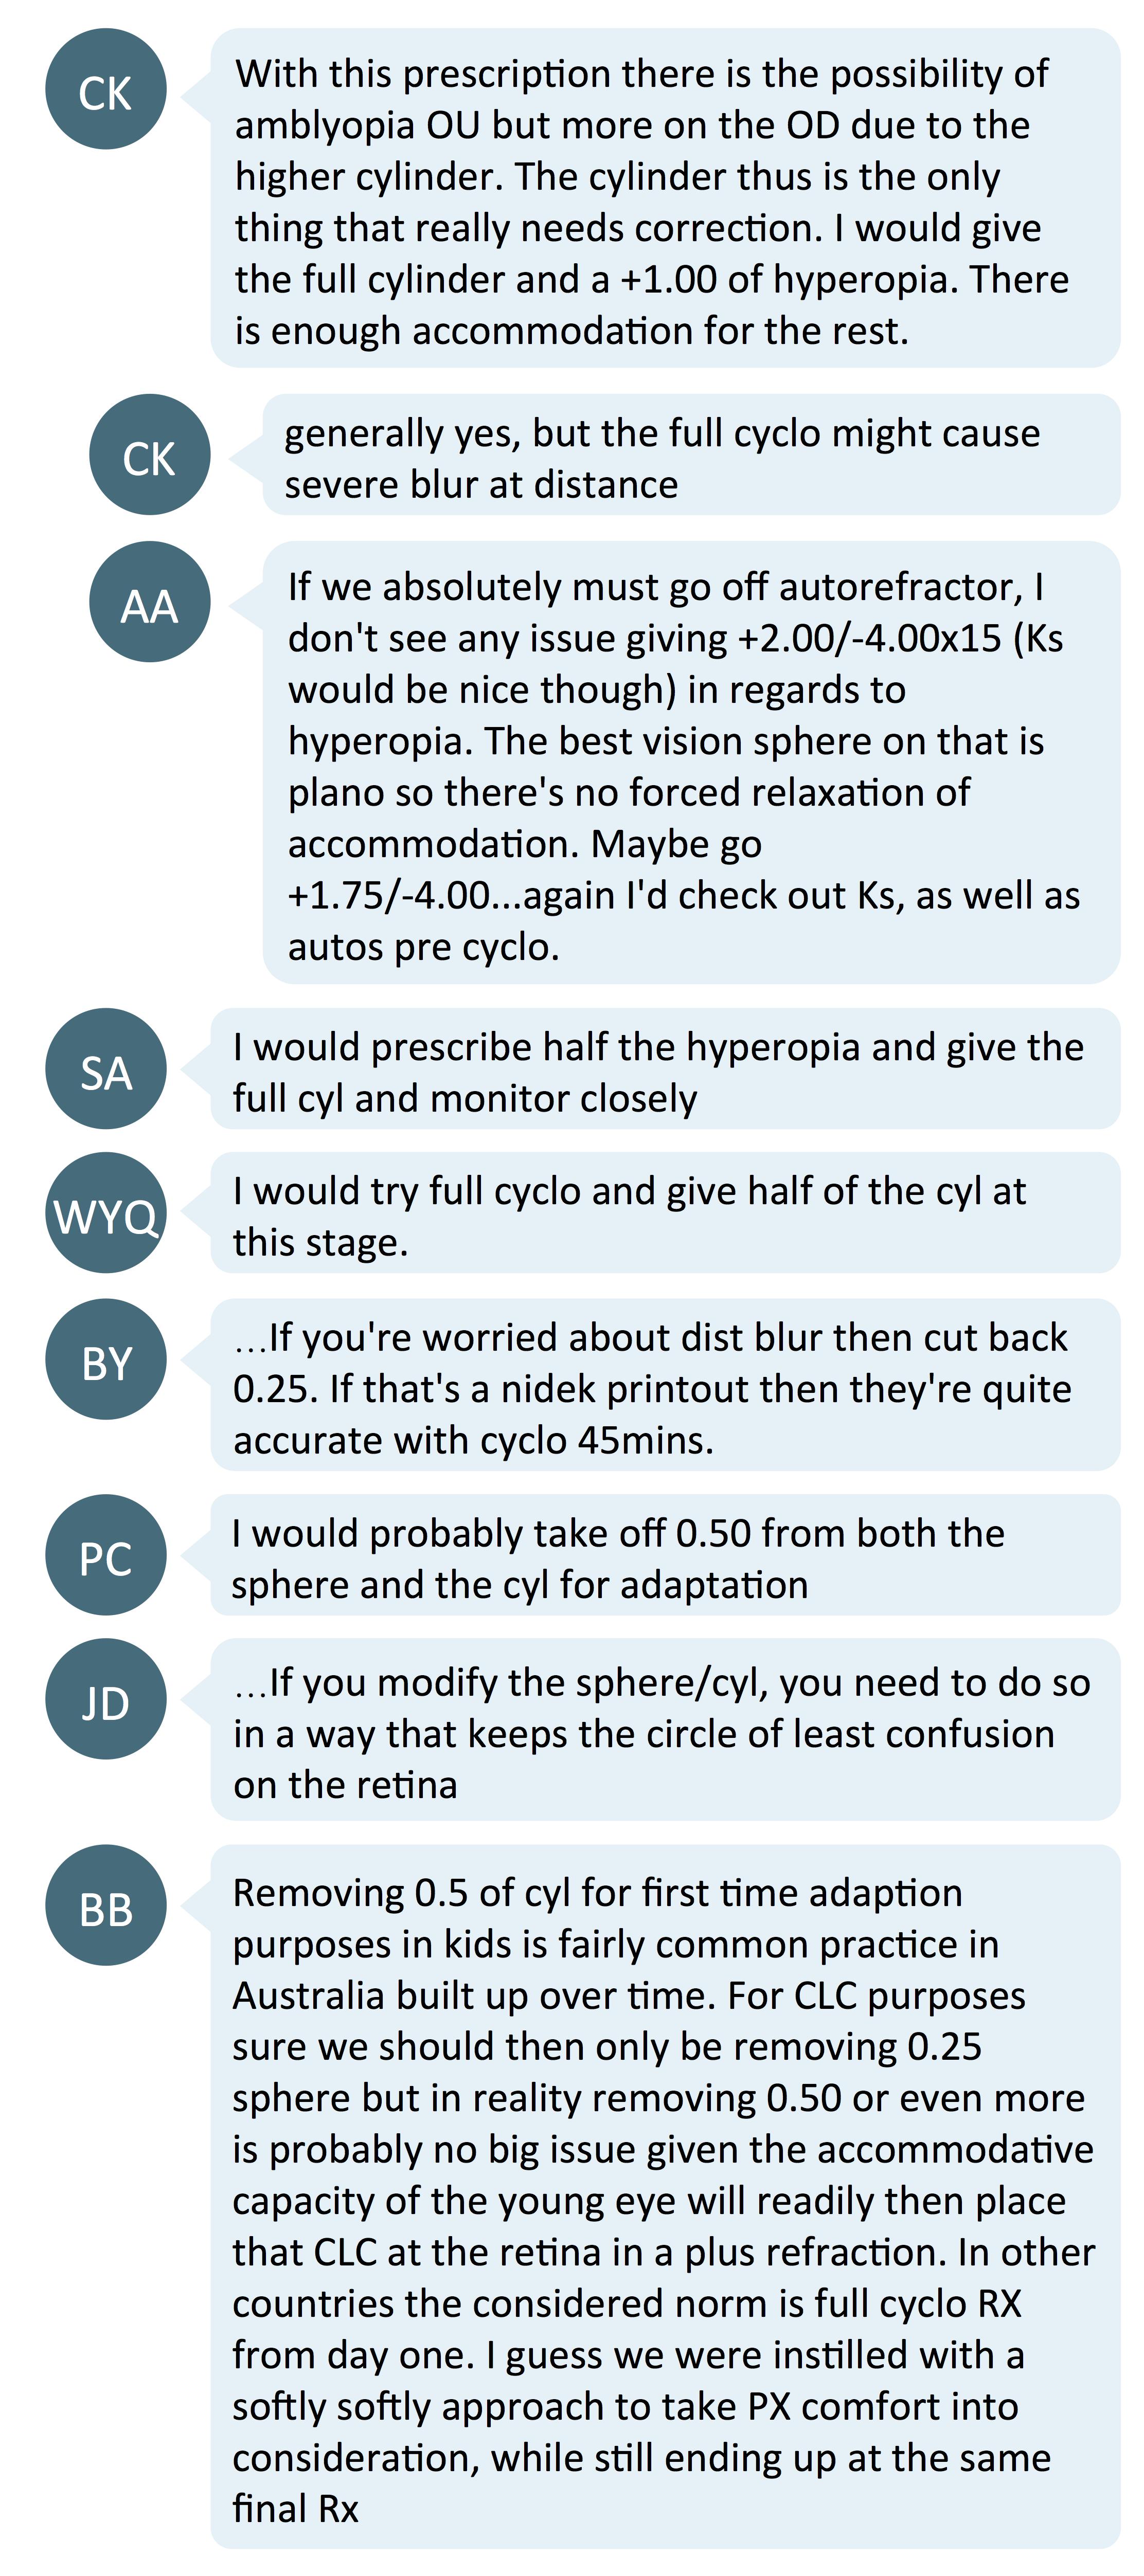 6th refractive challenge